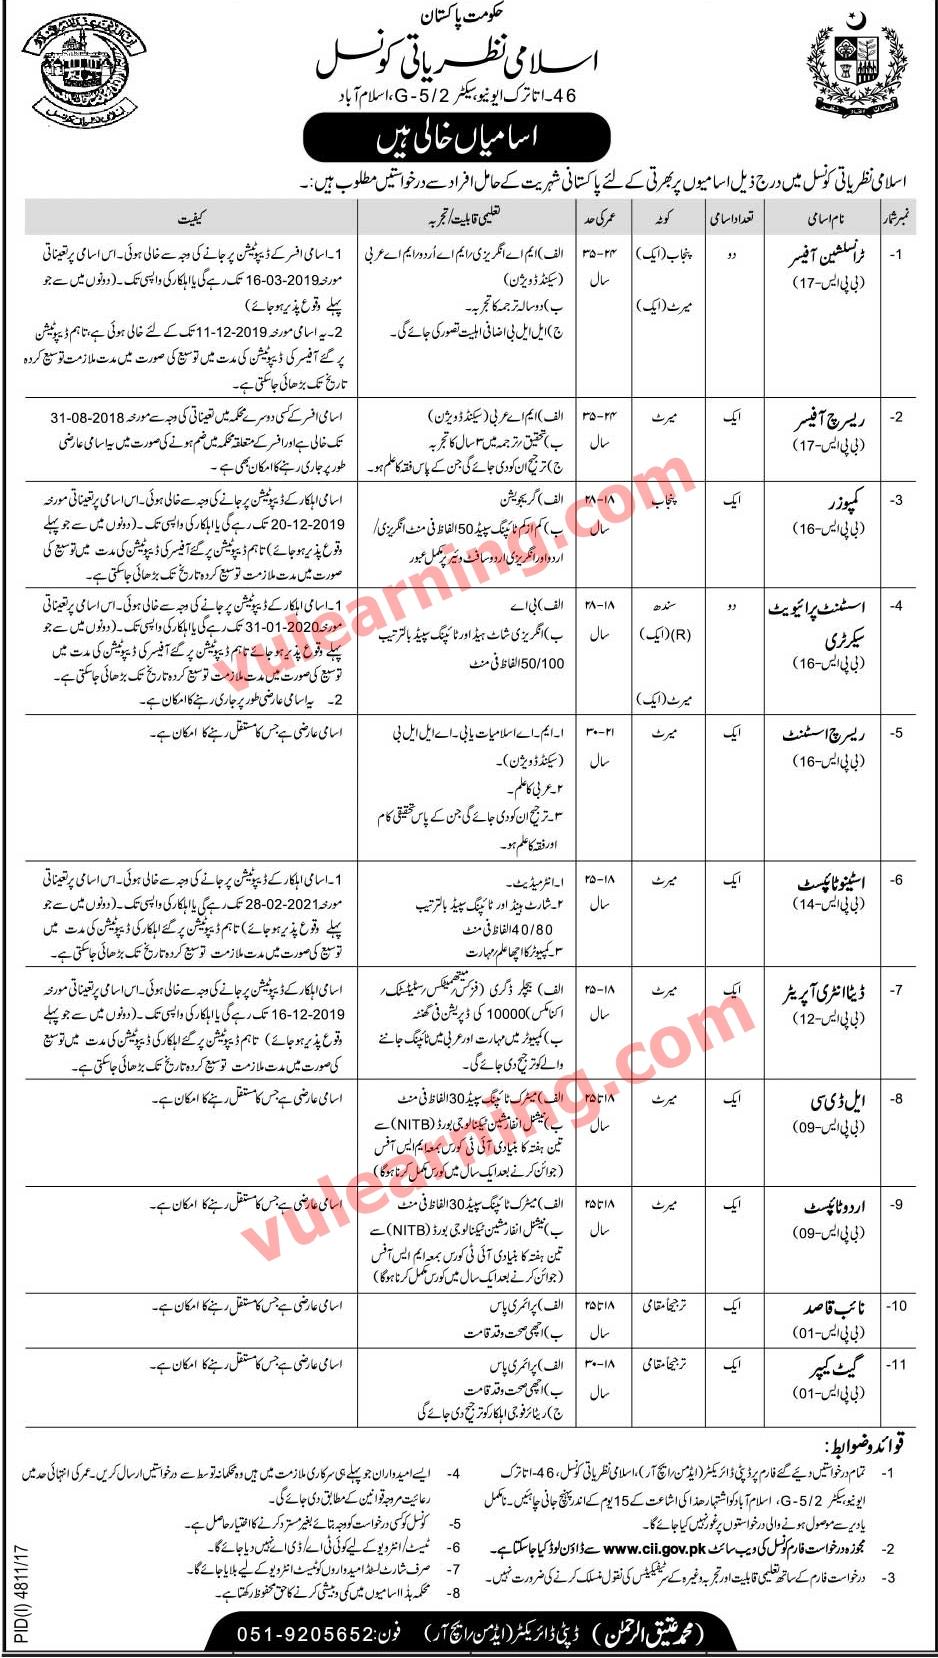 Council Of Islamic Ideology Islamabad Jobs 2018